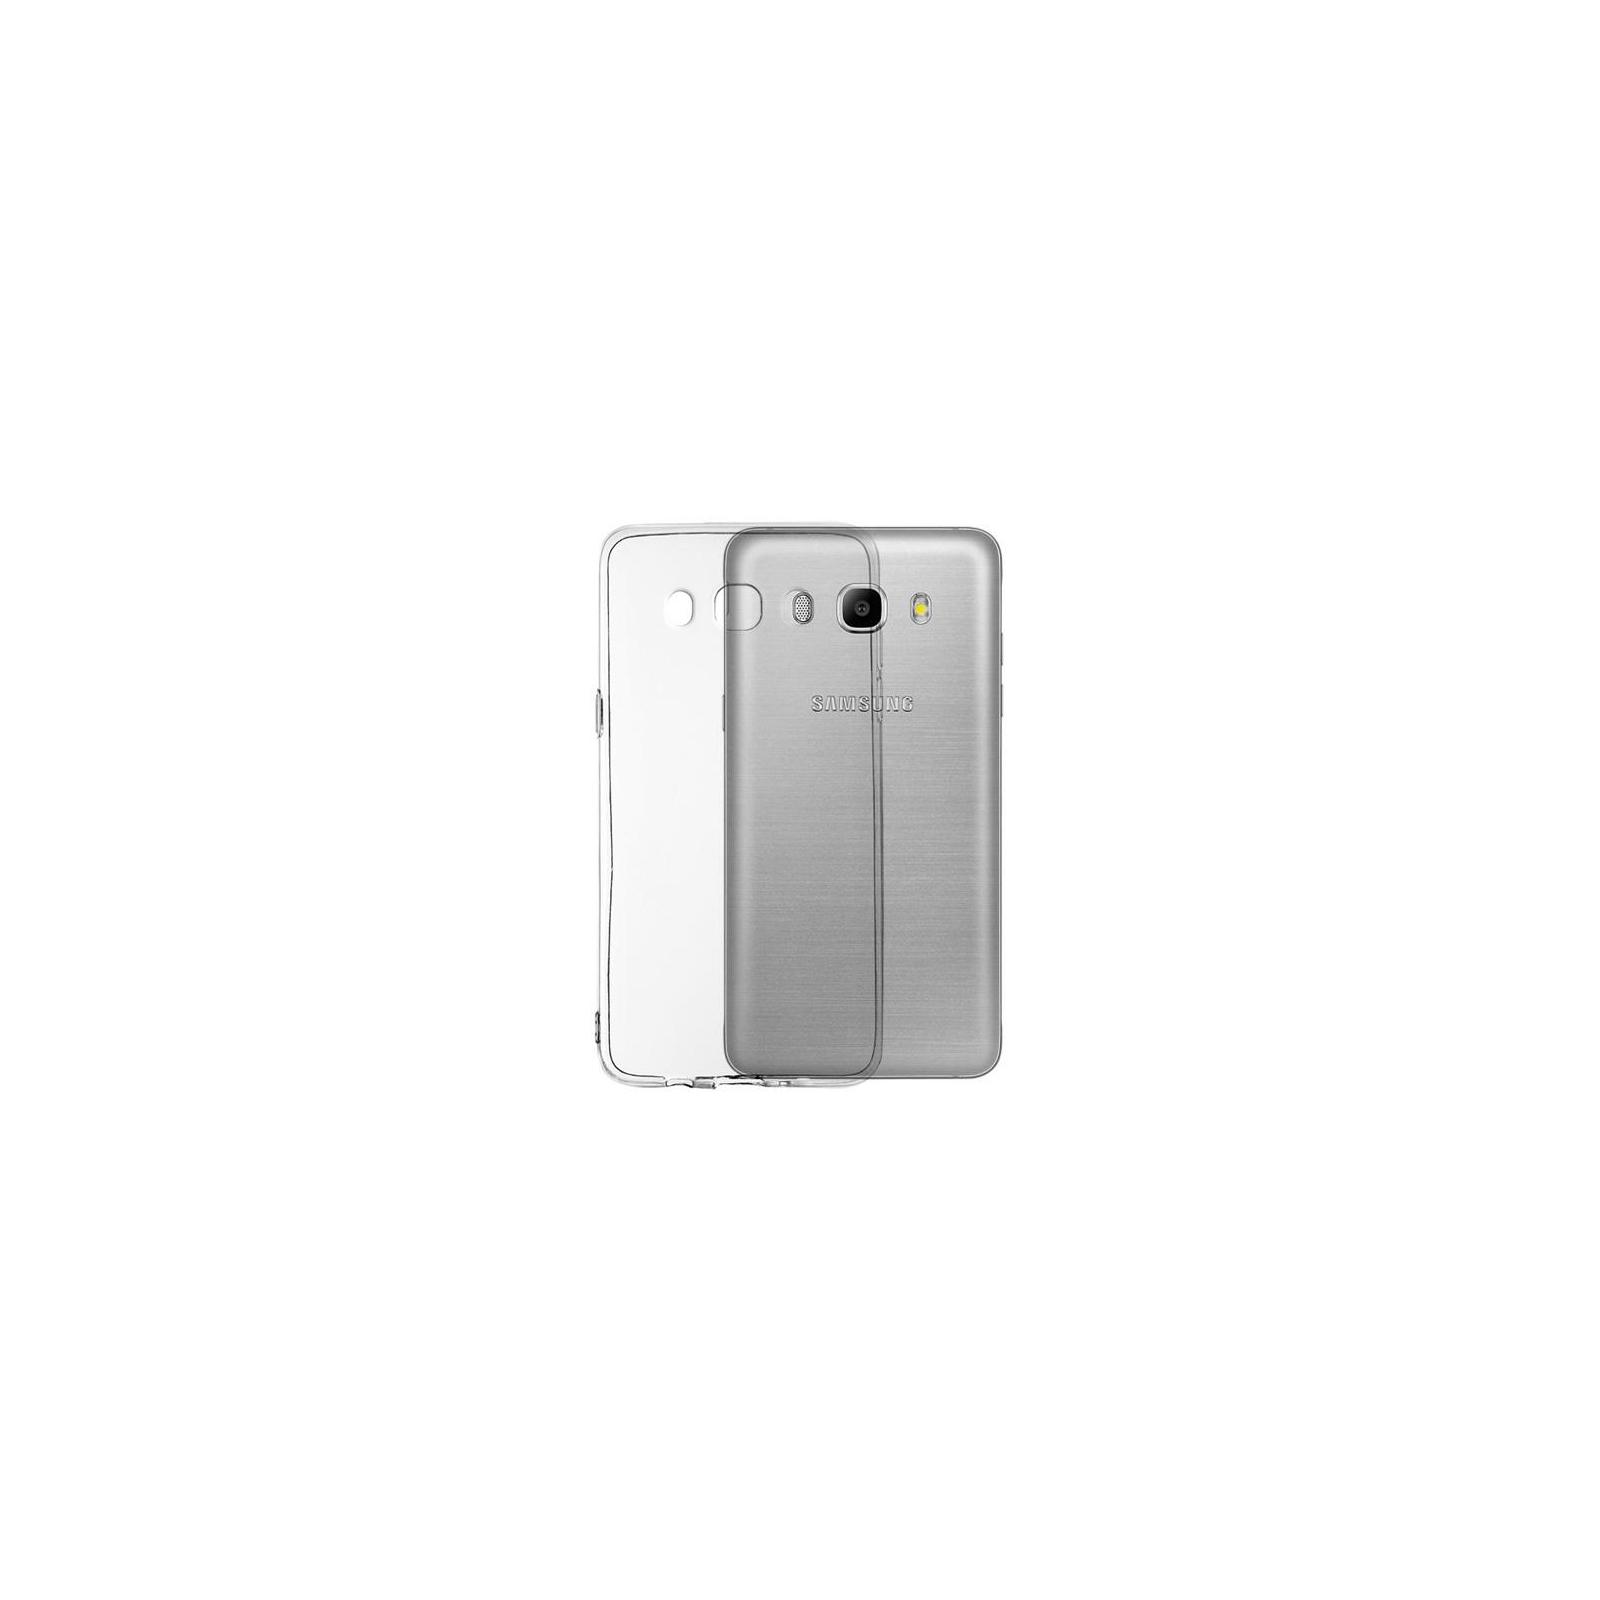 Чехол для моб. телефона Colorway ultrathin TPU case for Samsung Galaxy J5 (2016) SM-J510 (CW-CTPSJ510) изображение 3